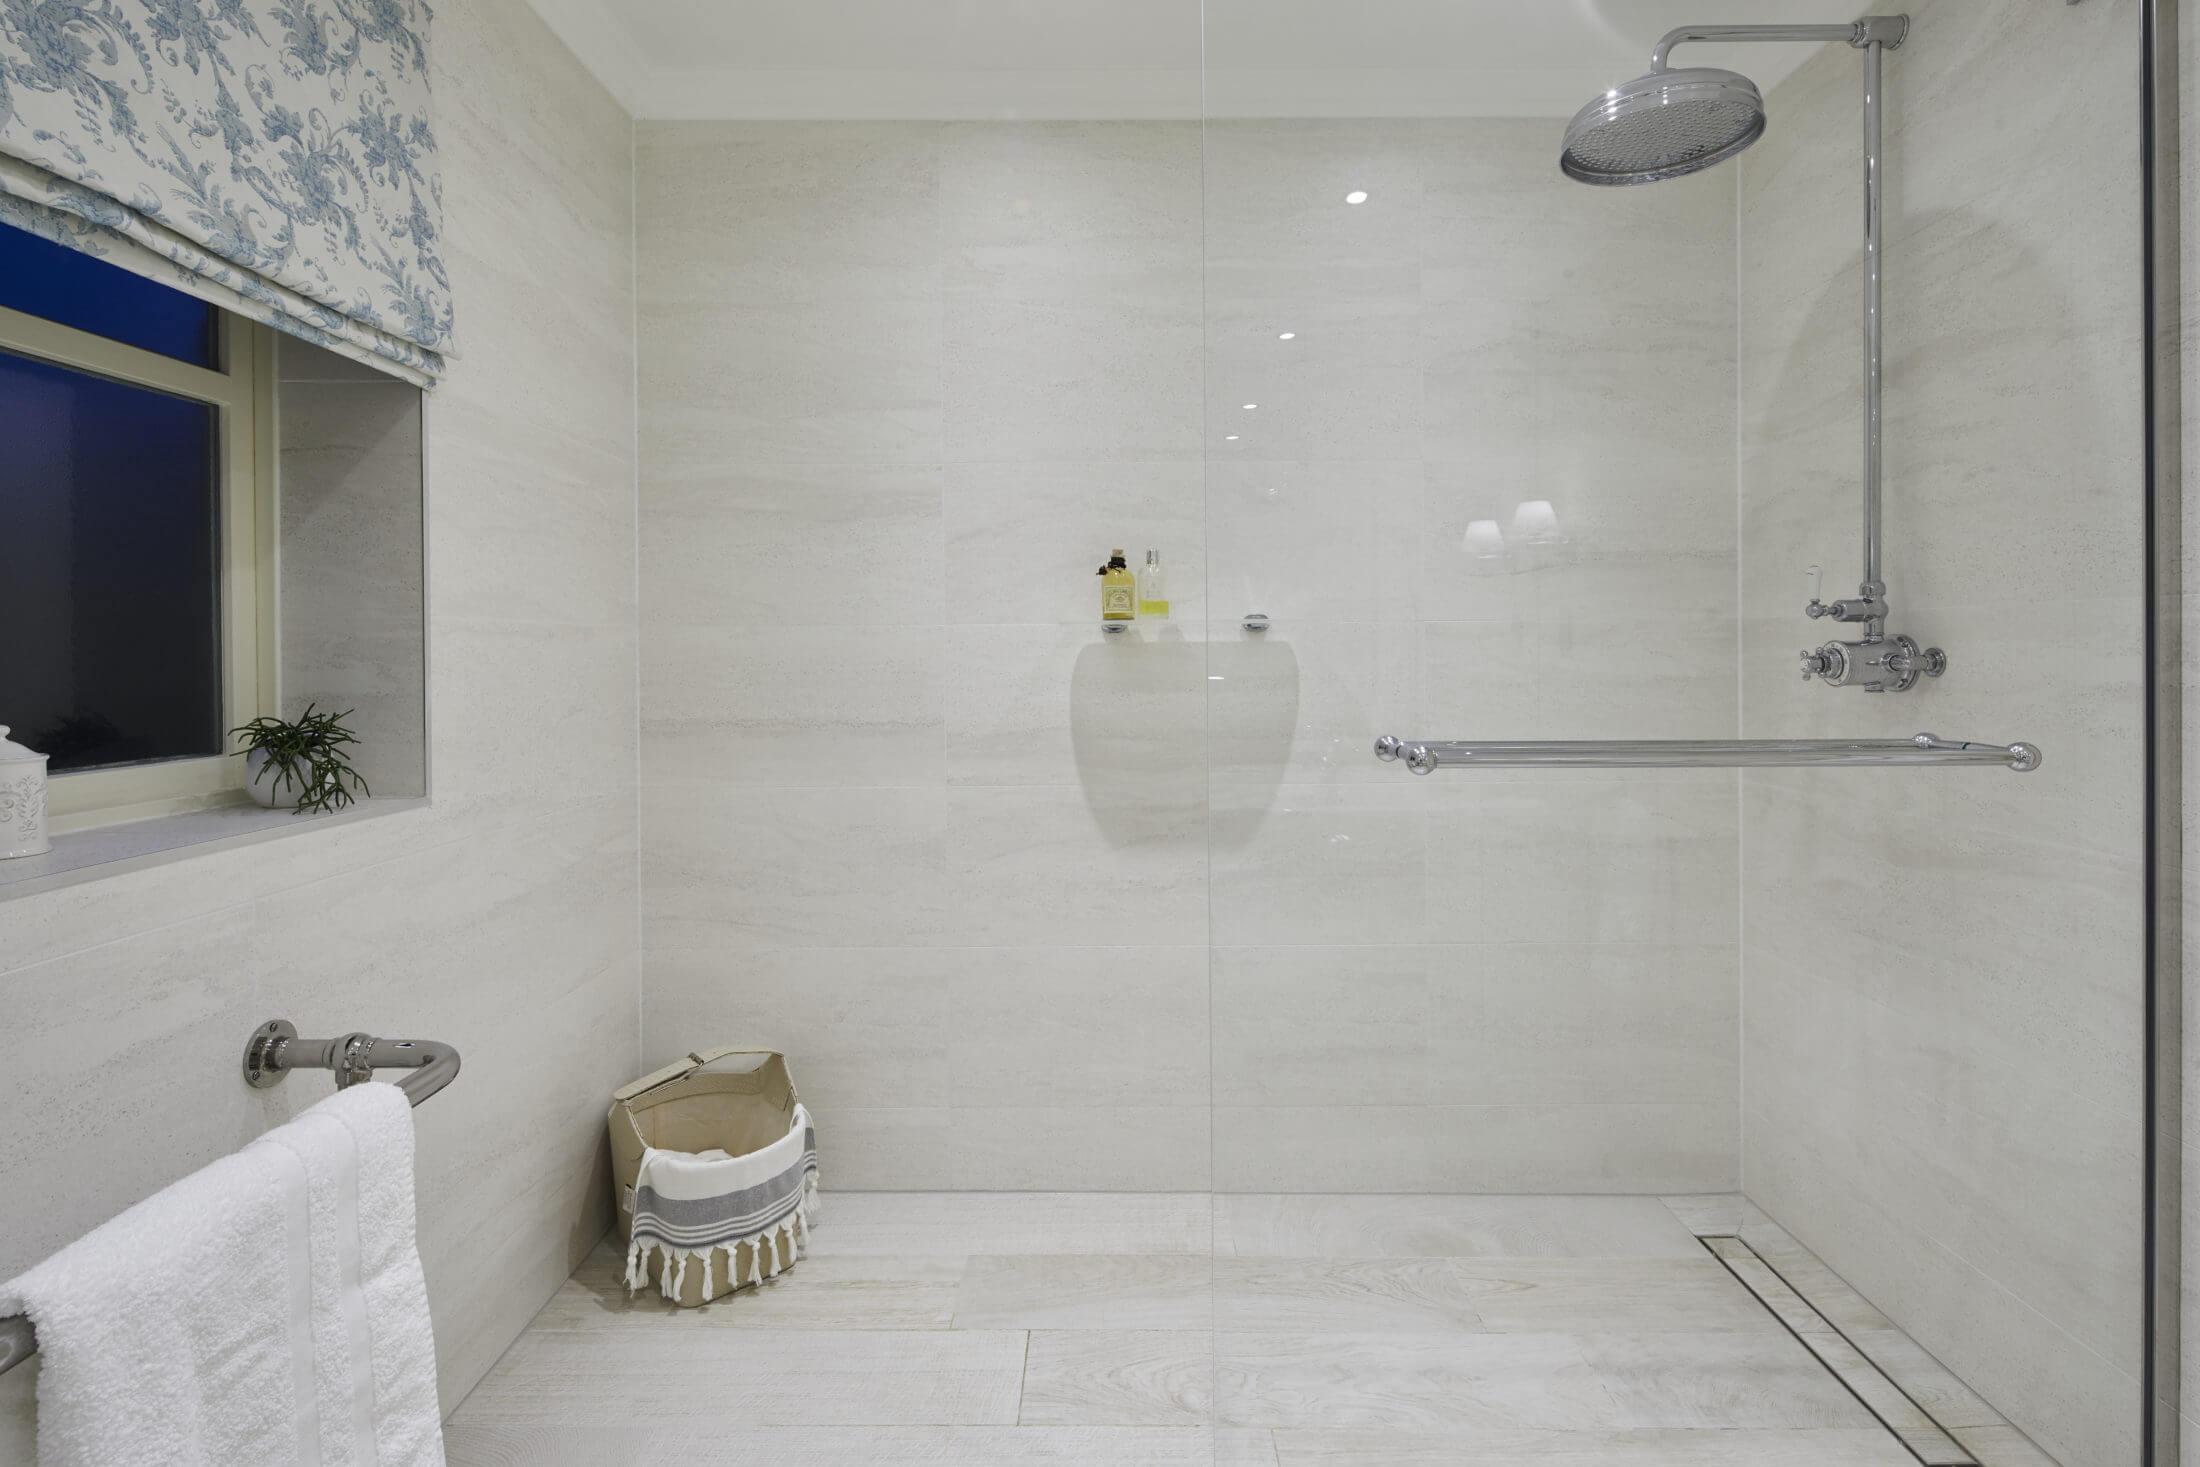 Wetroom in Walton-on-Thames